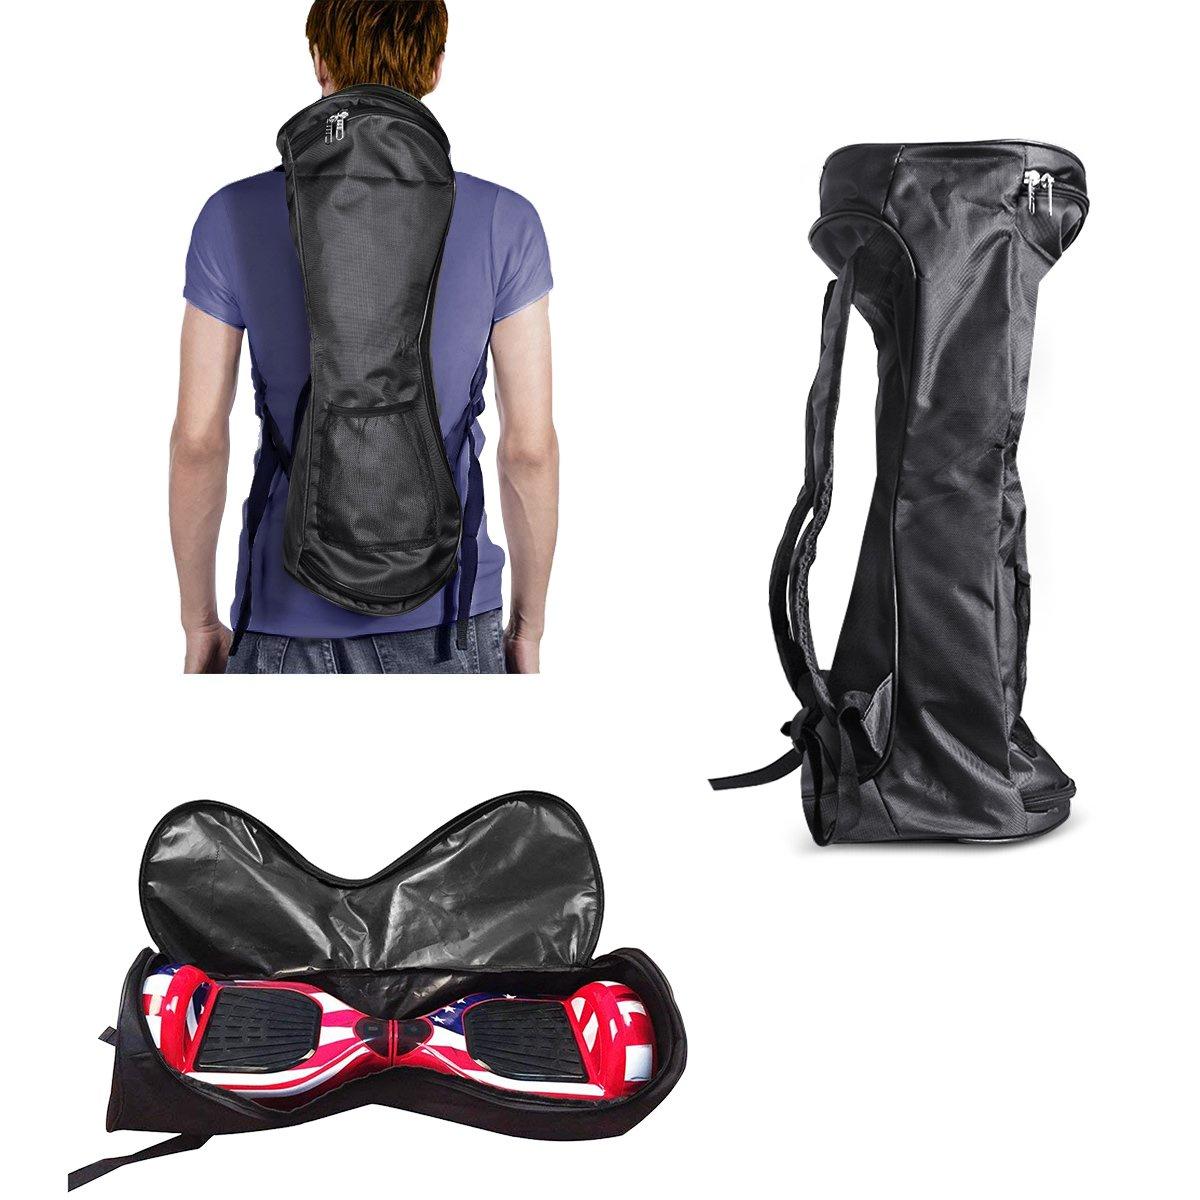 GameXcel Self-Balancing Scooter Carrying Handbag Backpack Bag for 6.5